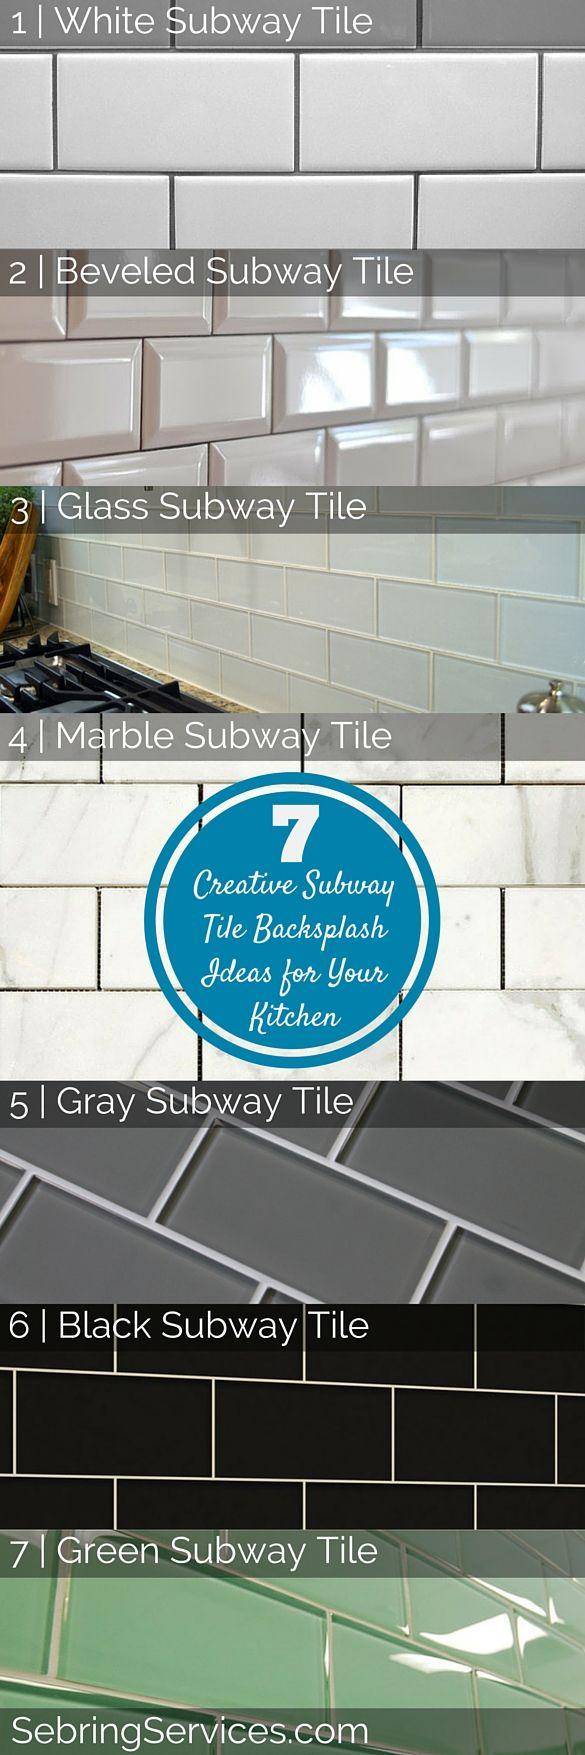 7 Creative Subway Tile Backsplash Ideas for Your Kitchen | Kitchen ...